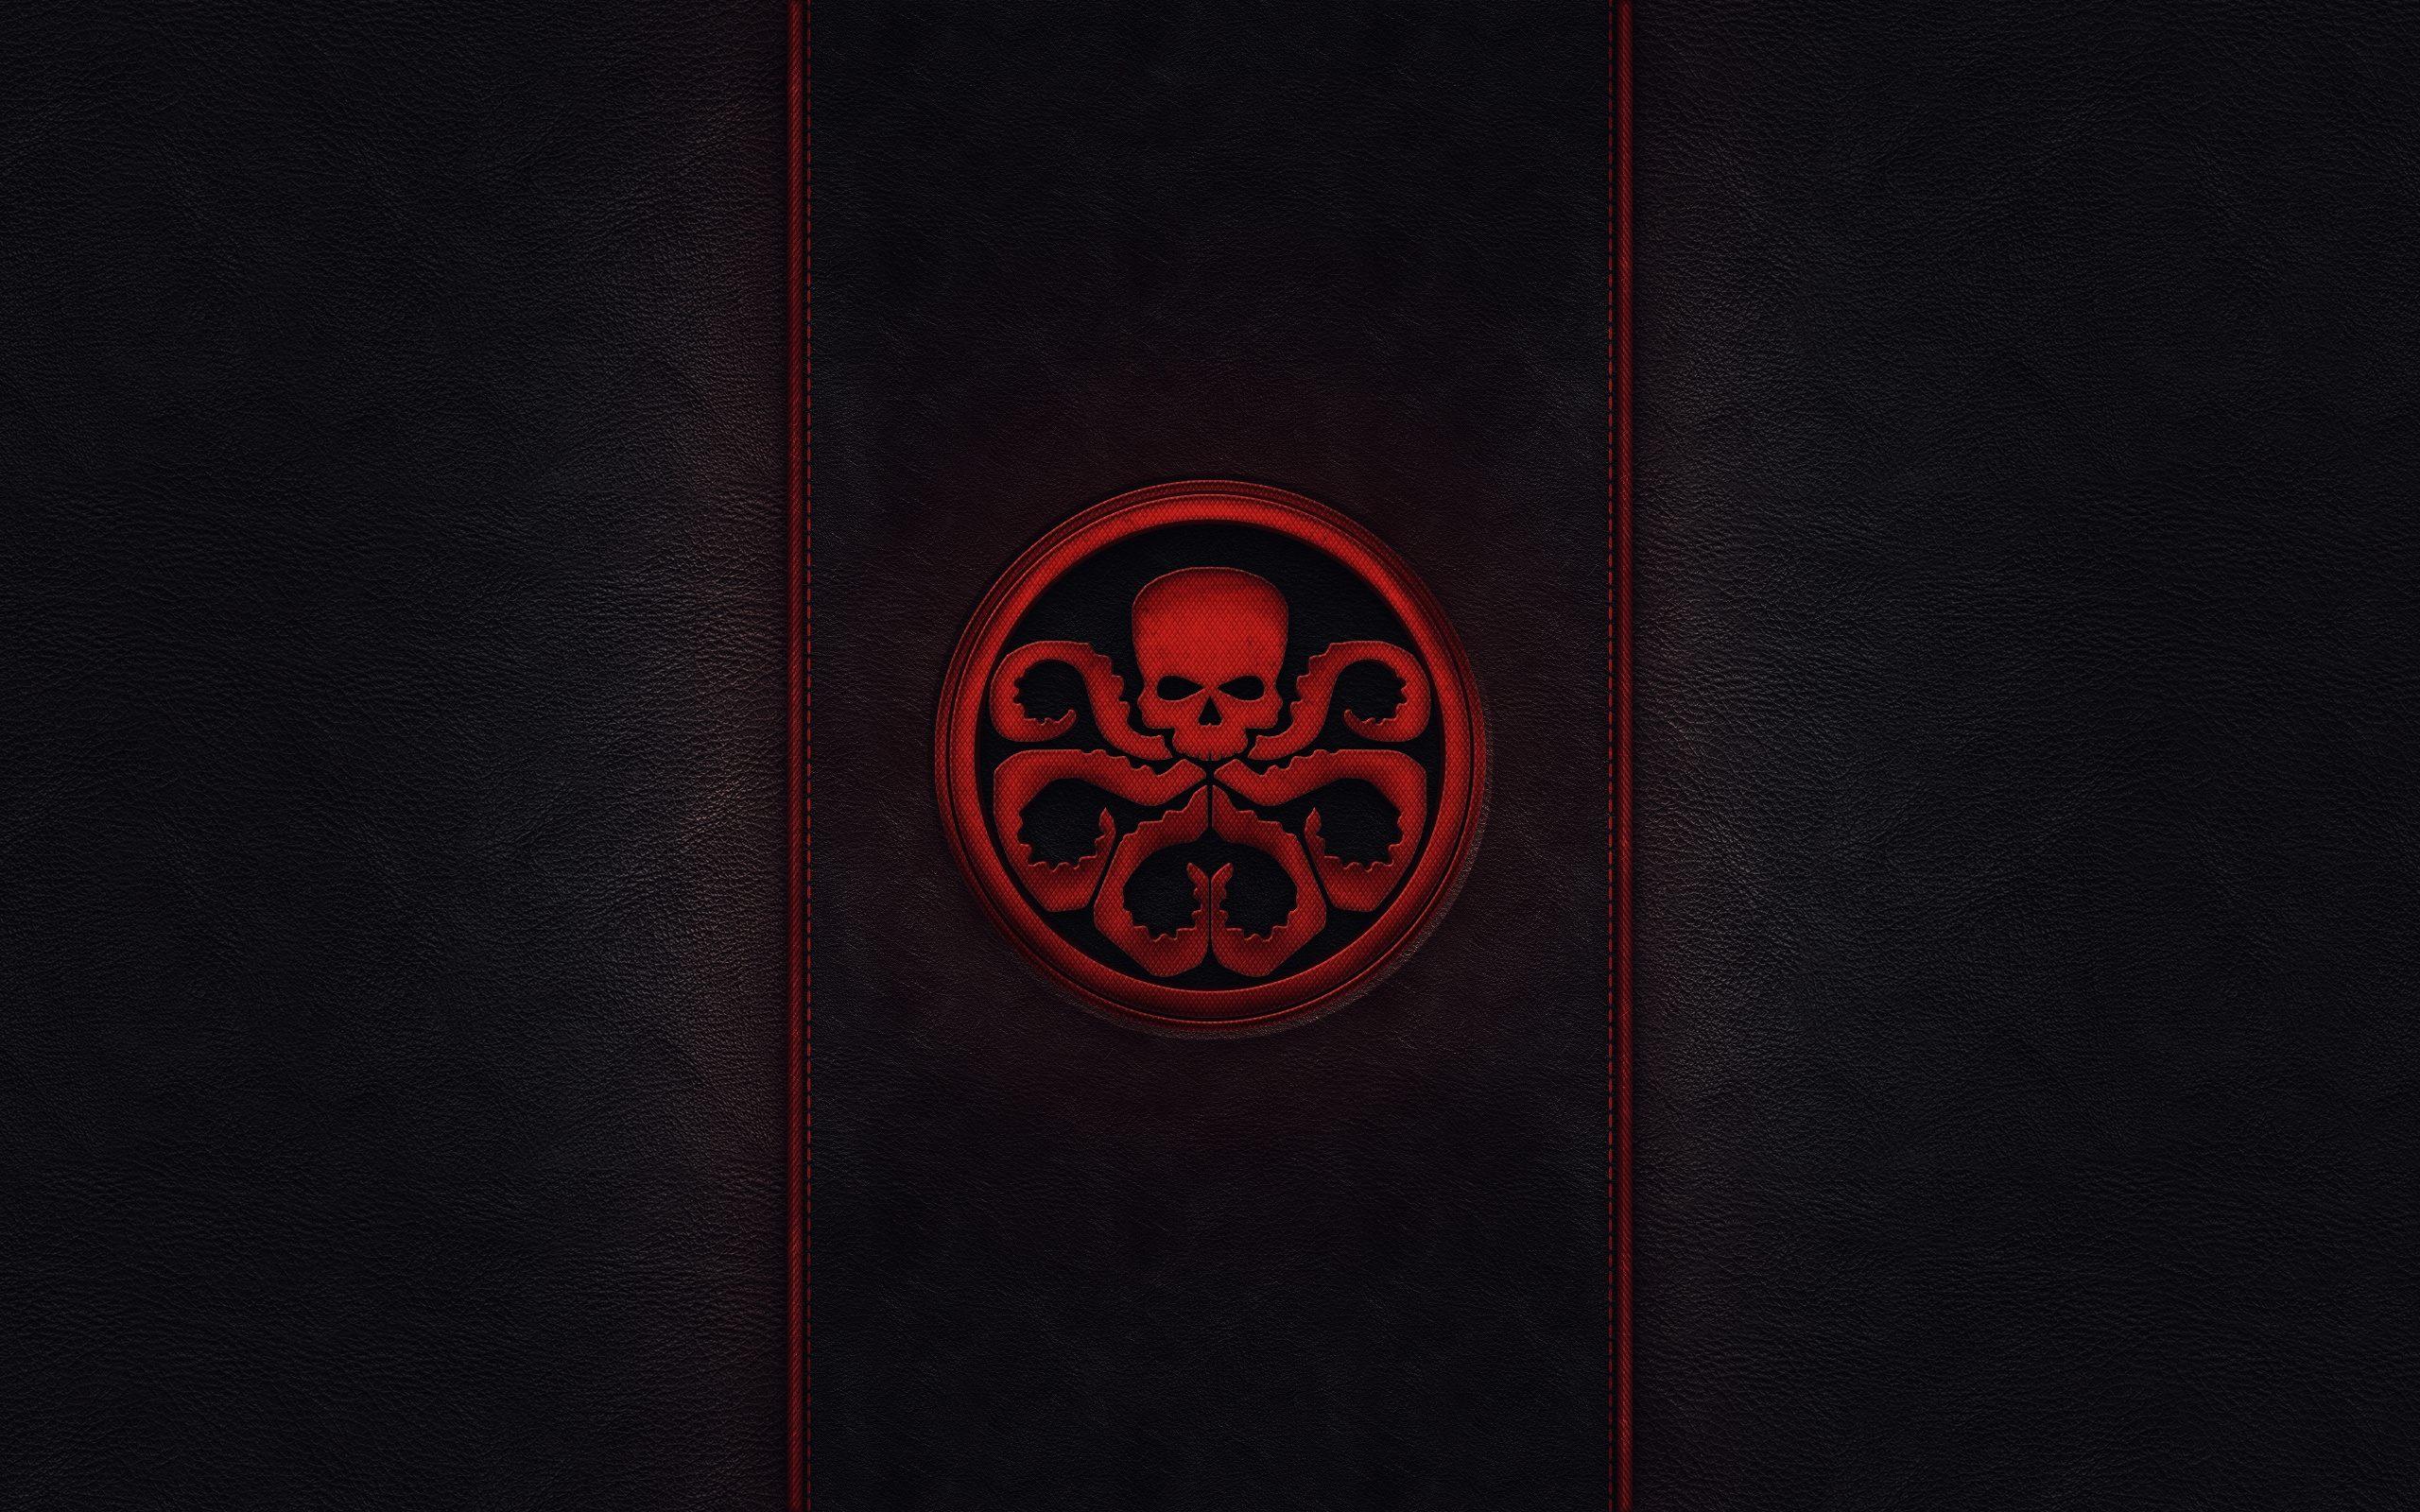 Marvel Superheroes 3d Wallpapers Captain America Hydra Minimalism Hd Superheroes 4k